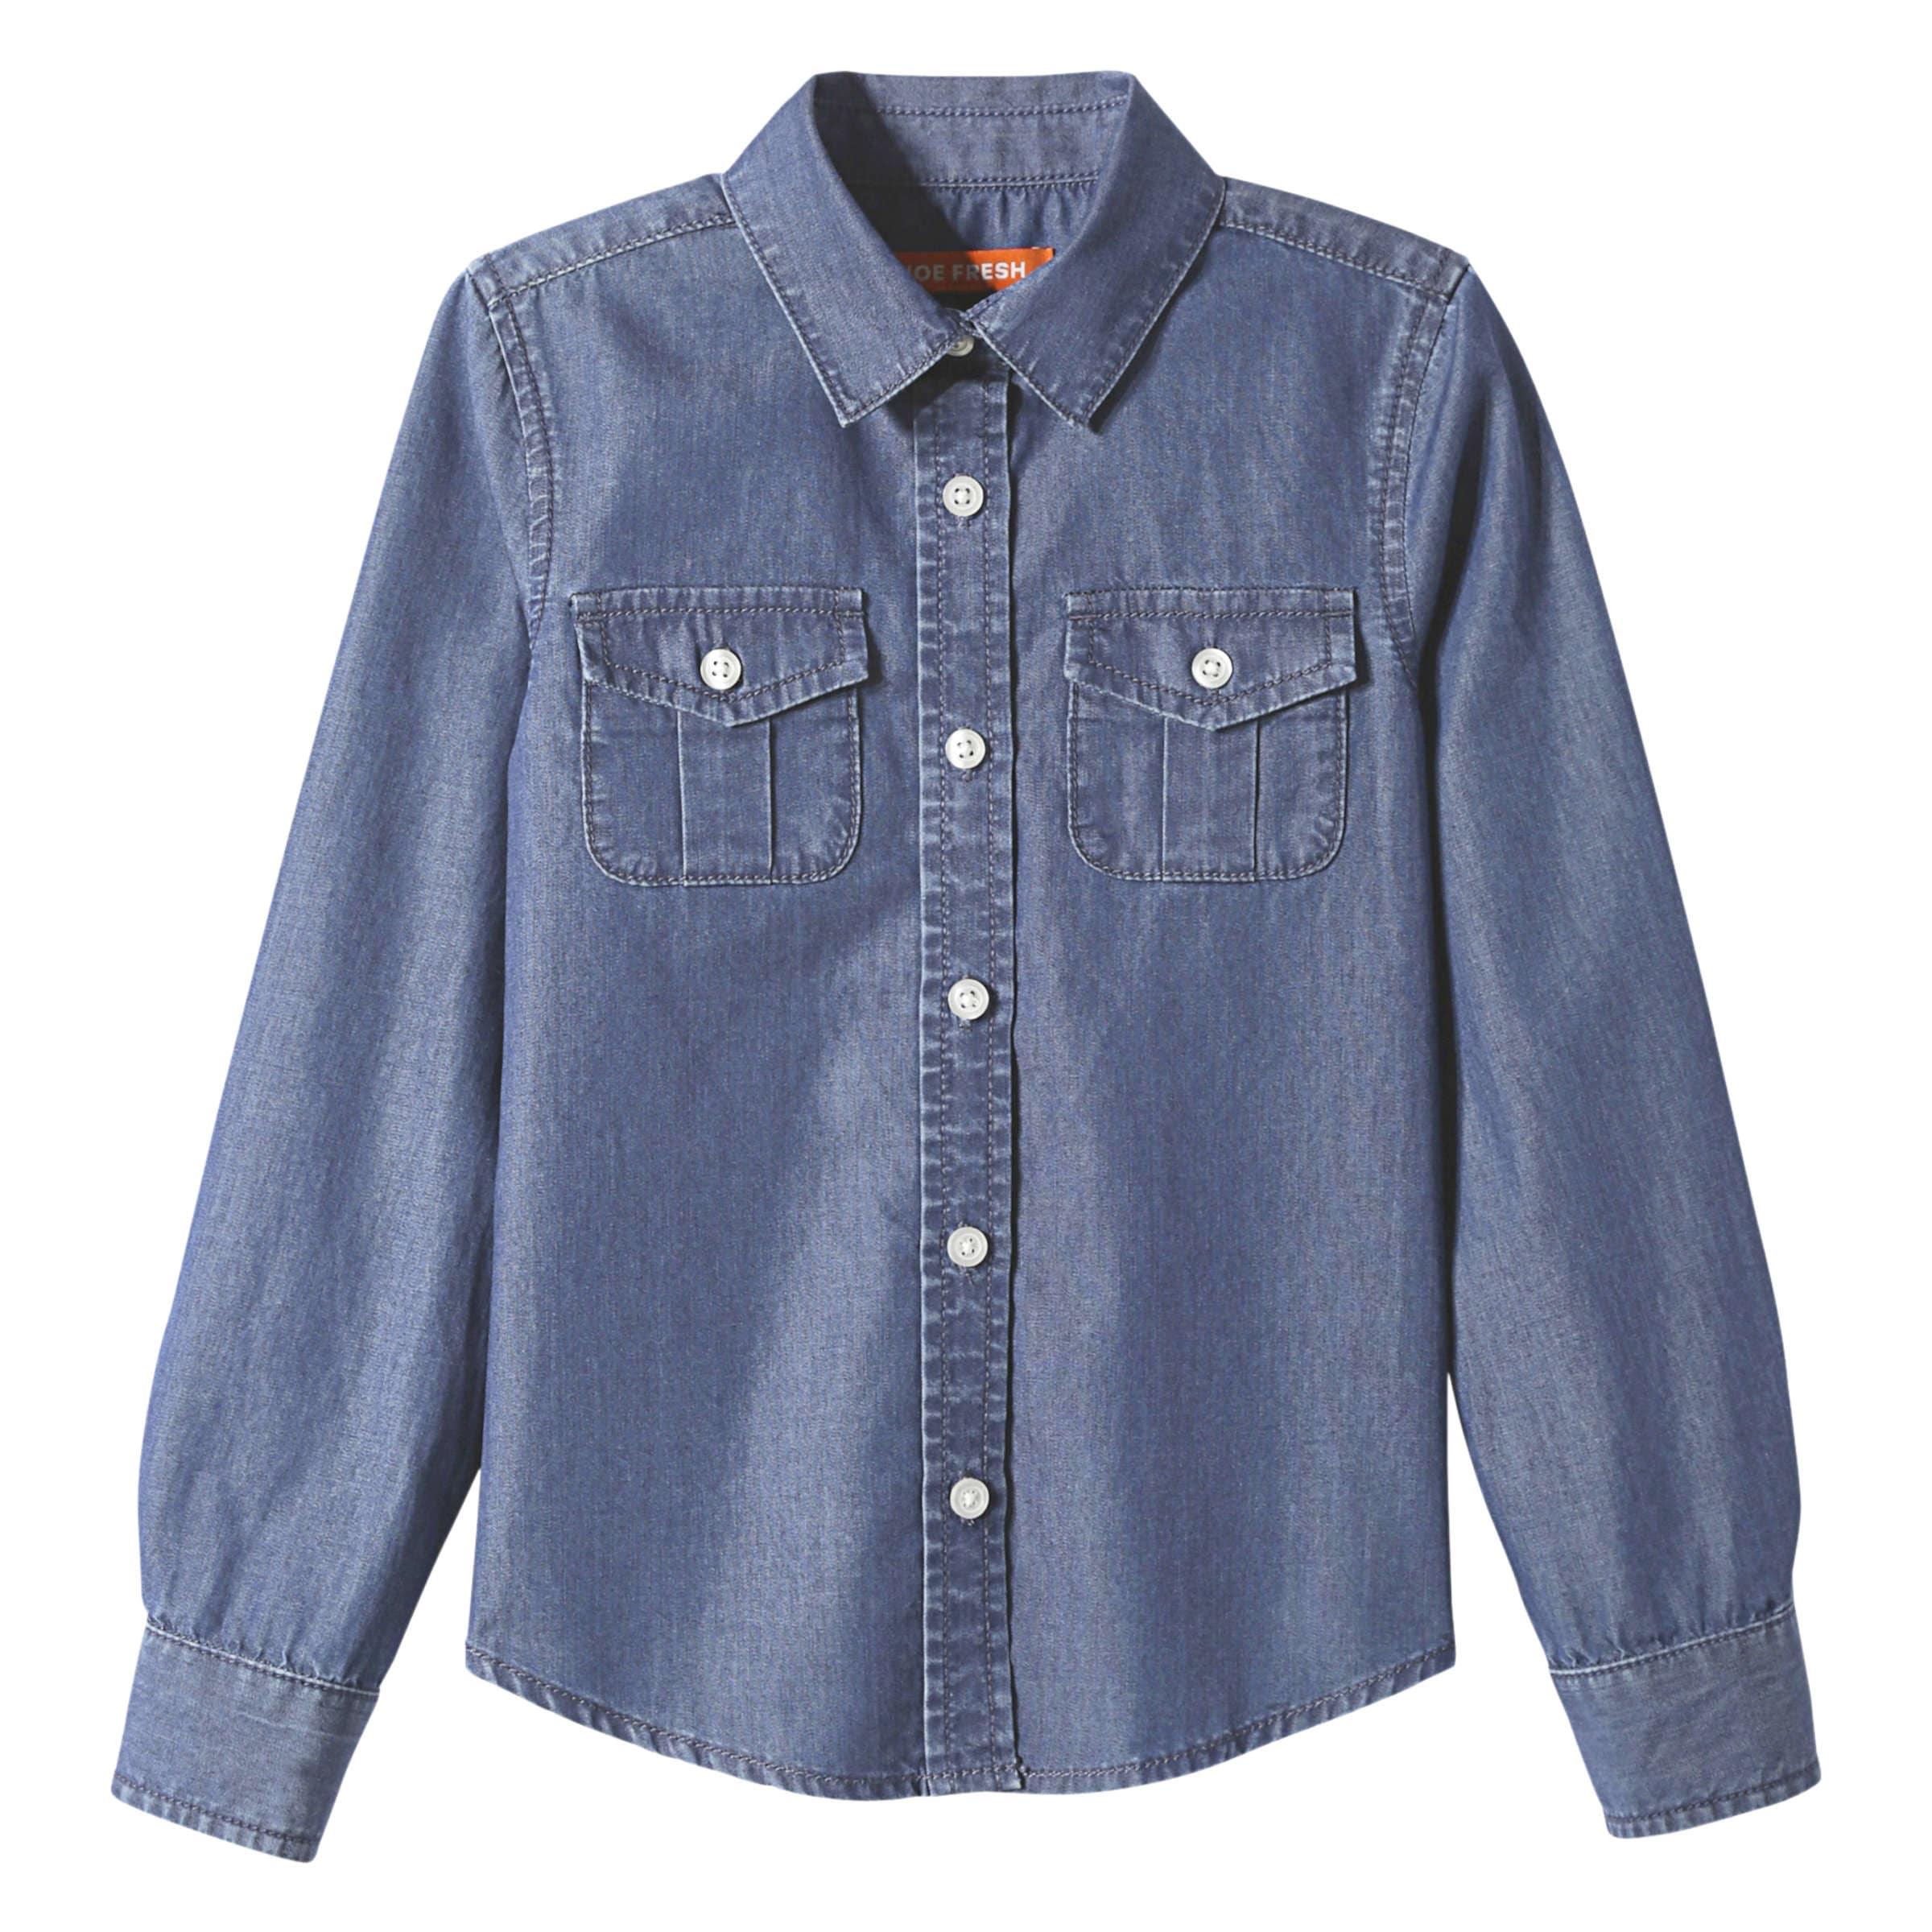 86e04b4e613 Kid Girls  Denim Shirt in Medium Wash from Joe Fresh